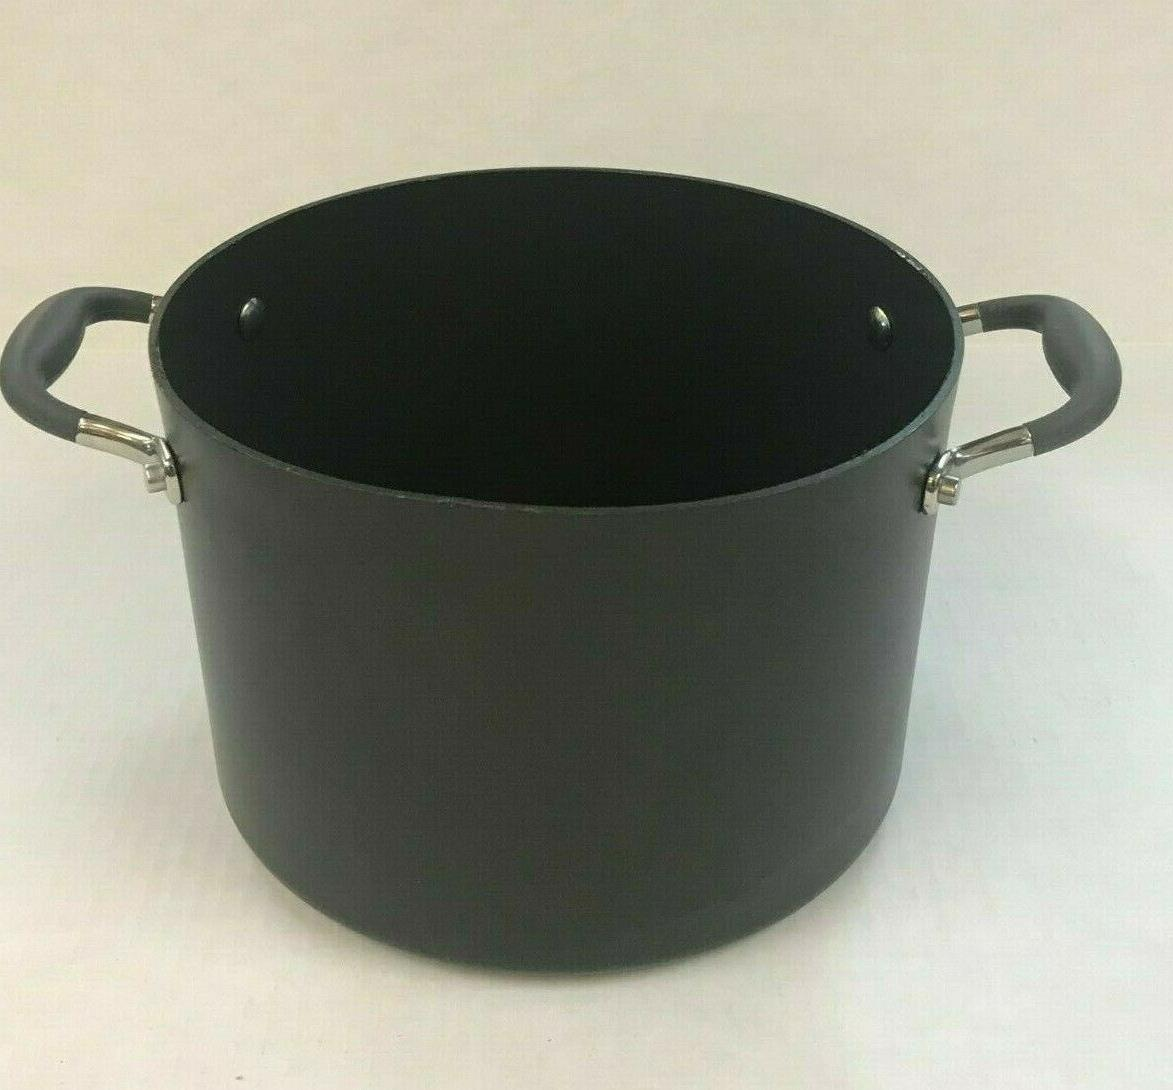 advanced hard anodized aluminum cookware